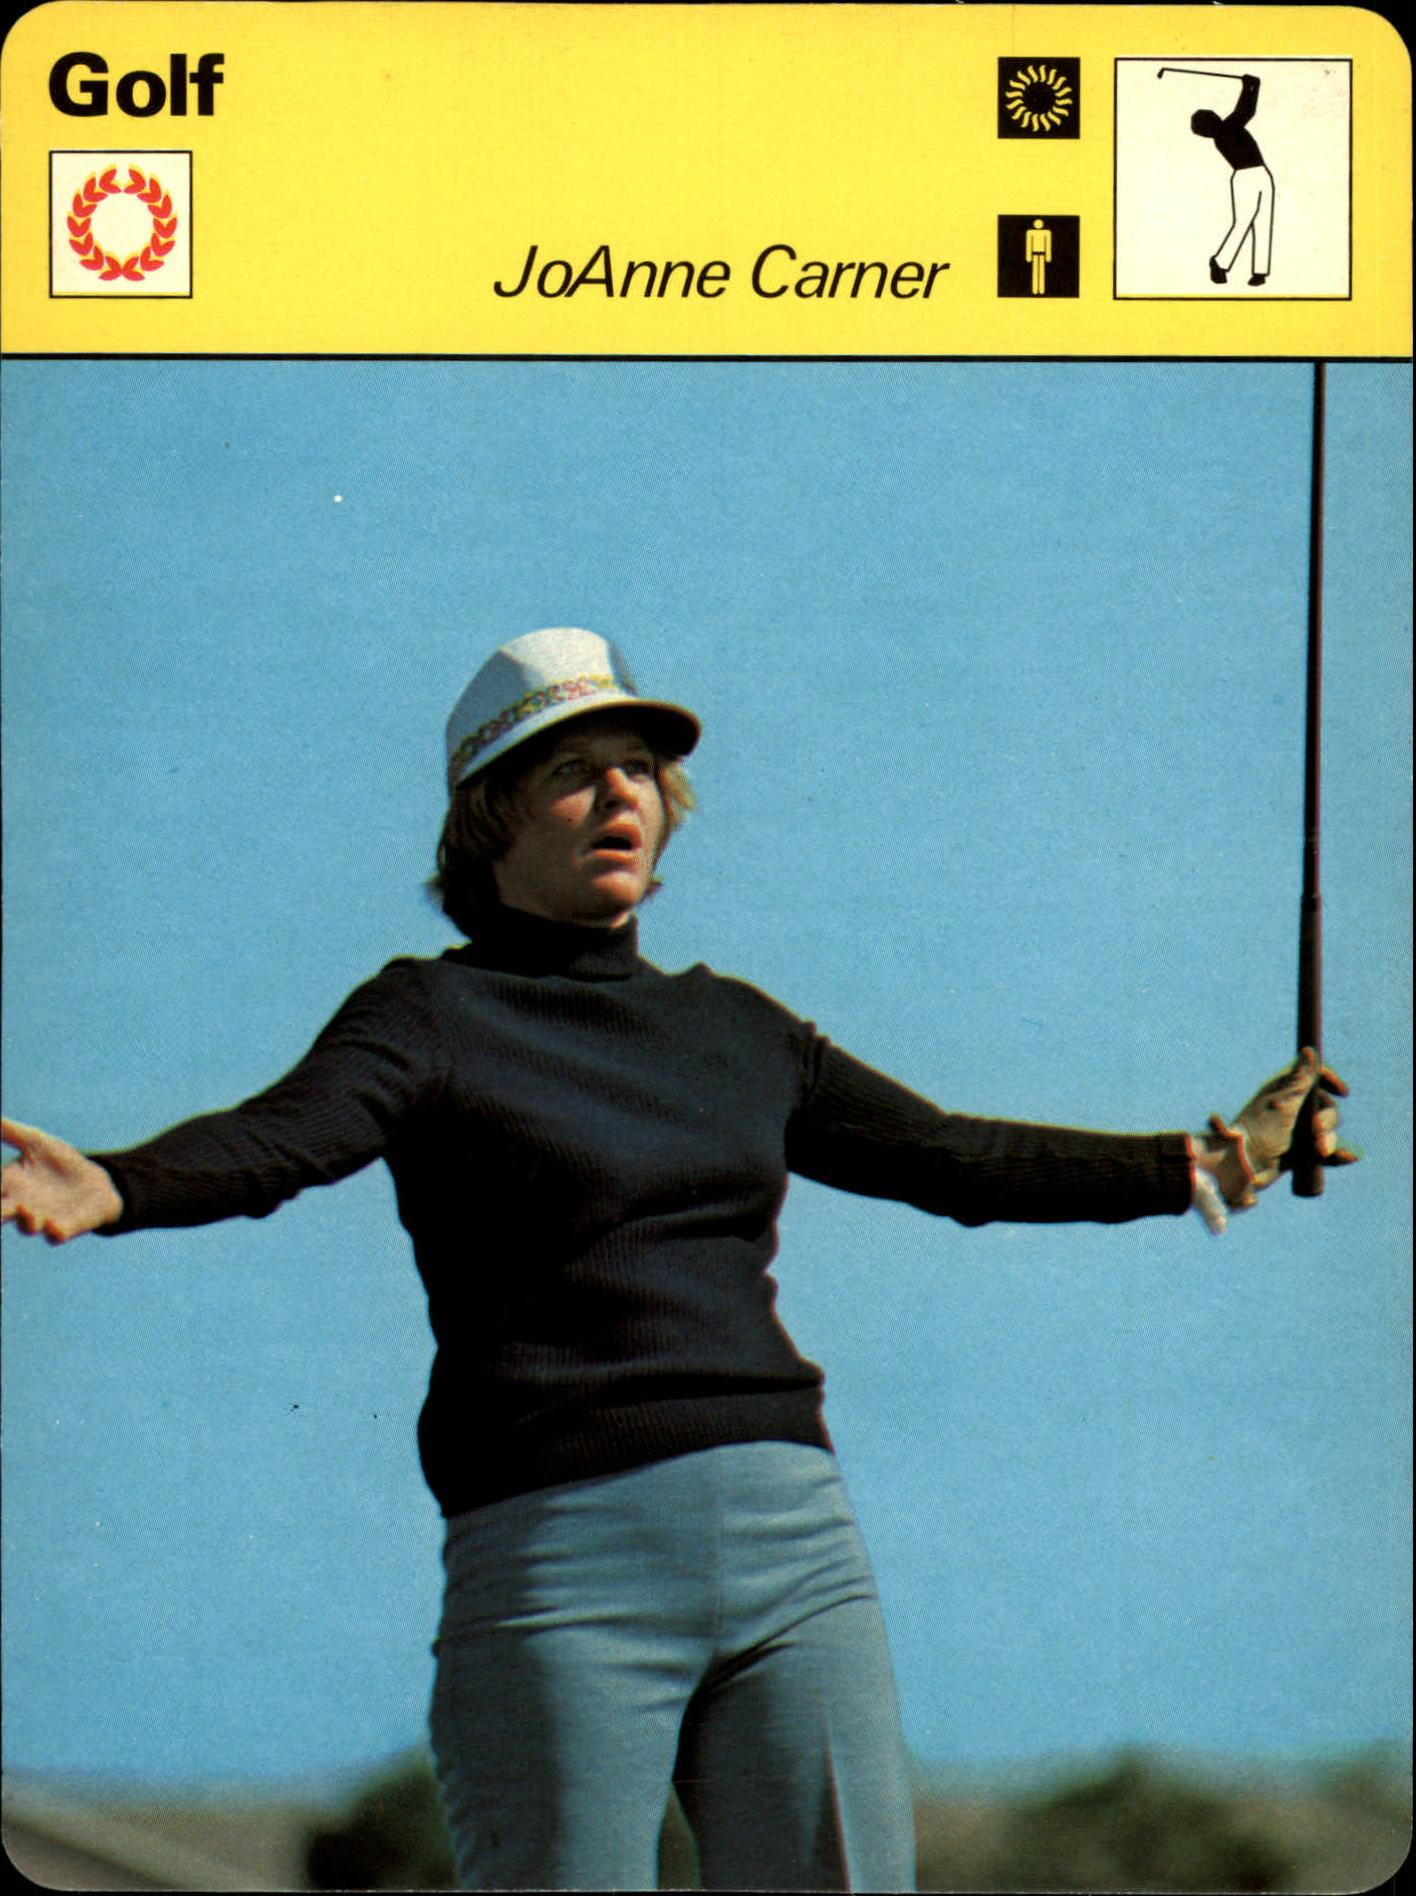 1977-79 Sportscaster Series 34 #3417 Joanne Carner